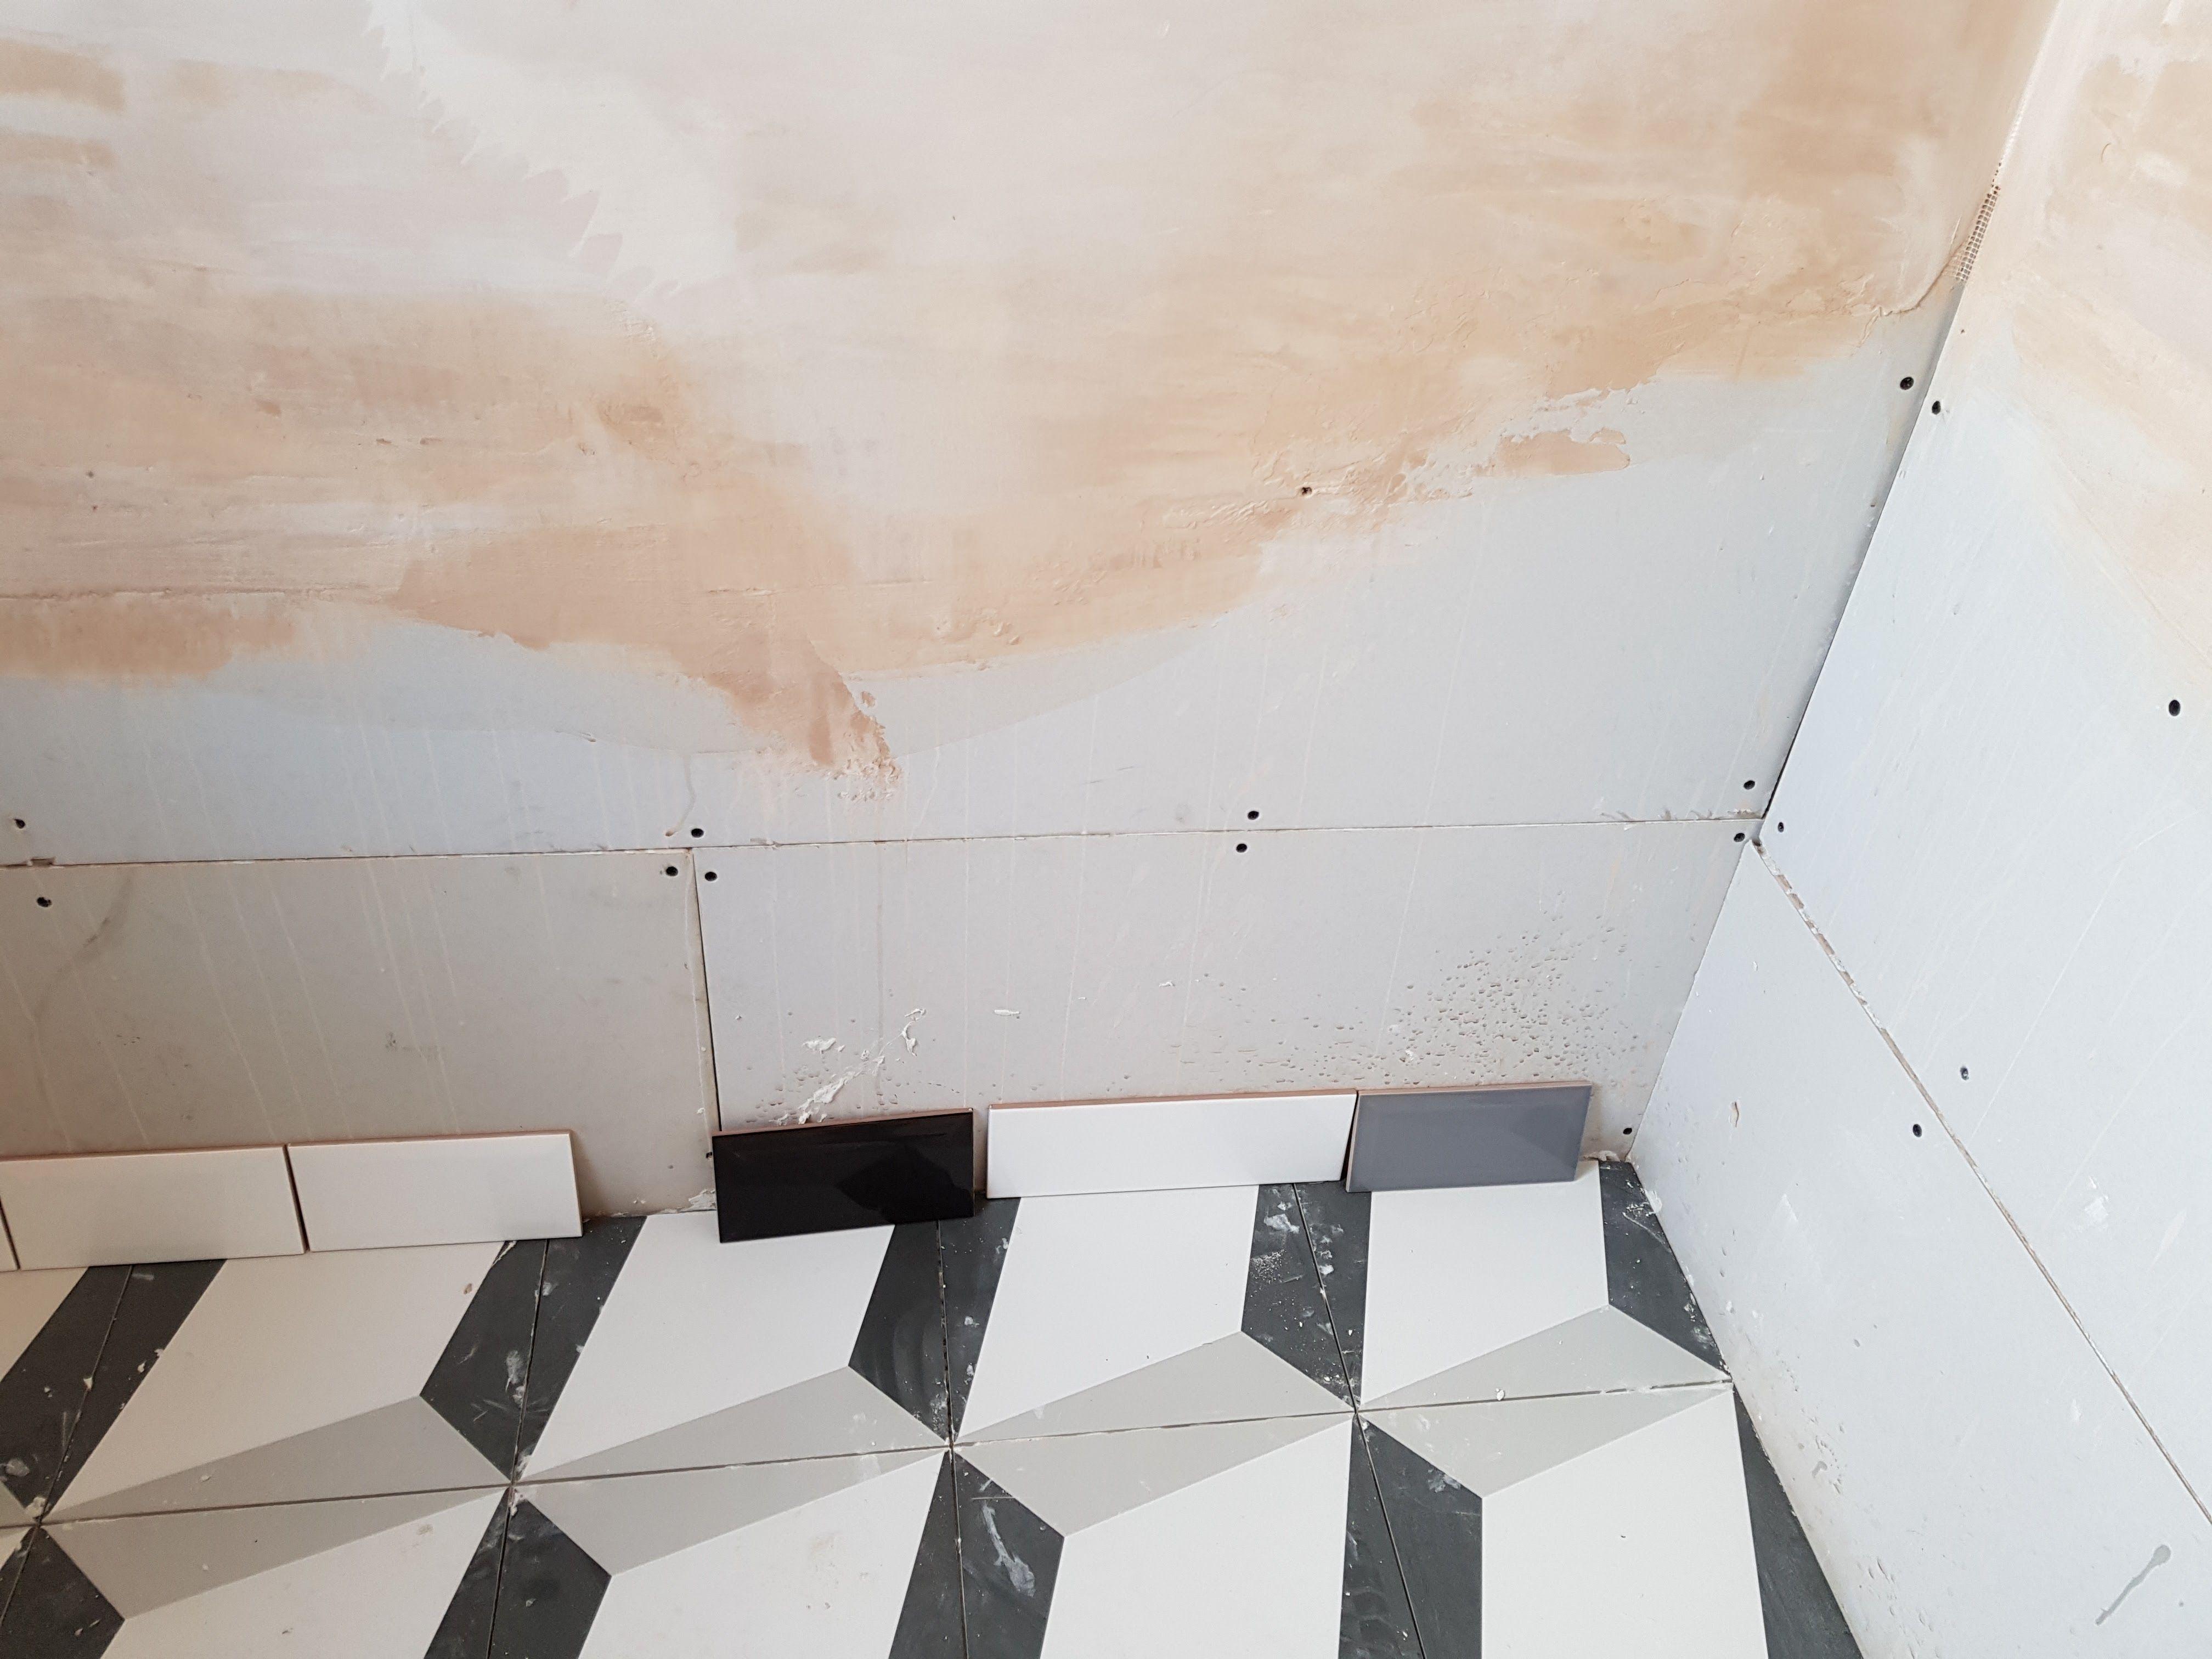 Modern Bathroom Tile Options Elaboration - Bathroom Design Ideas ...